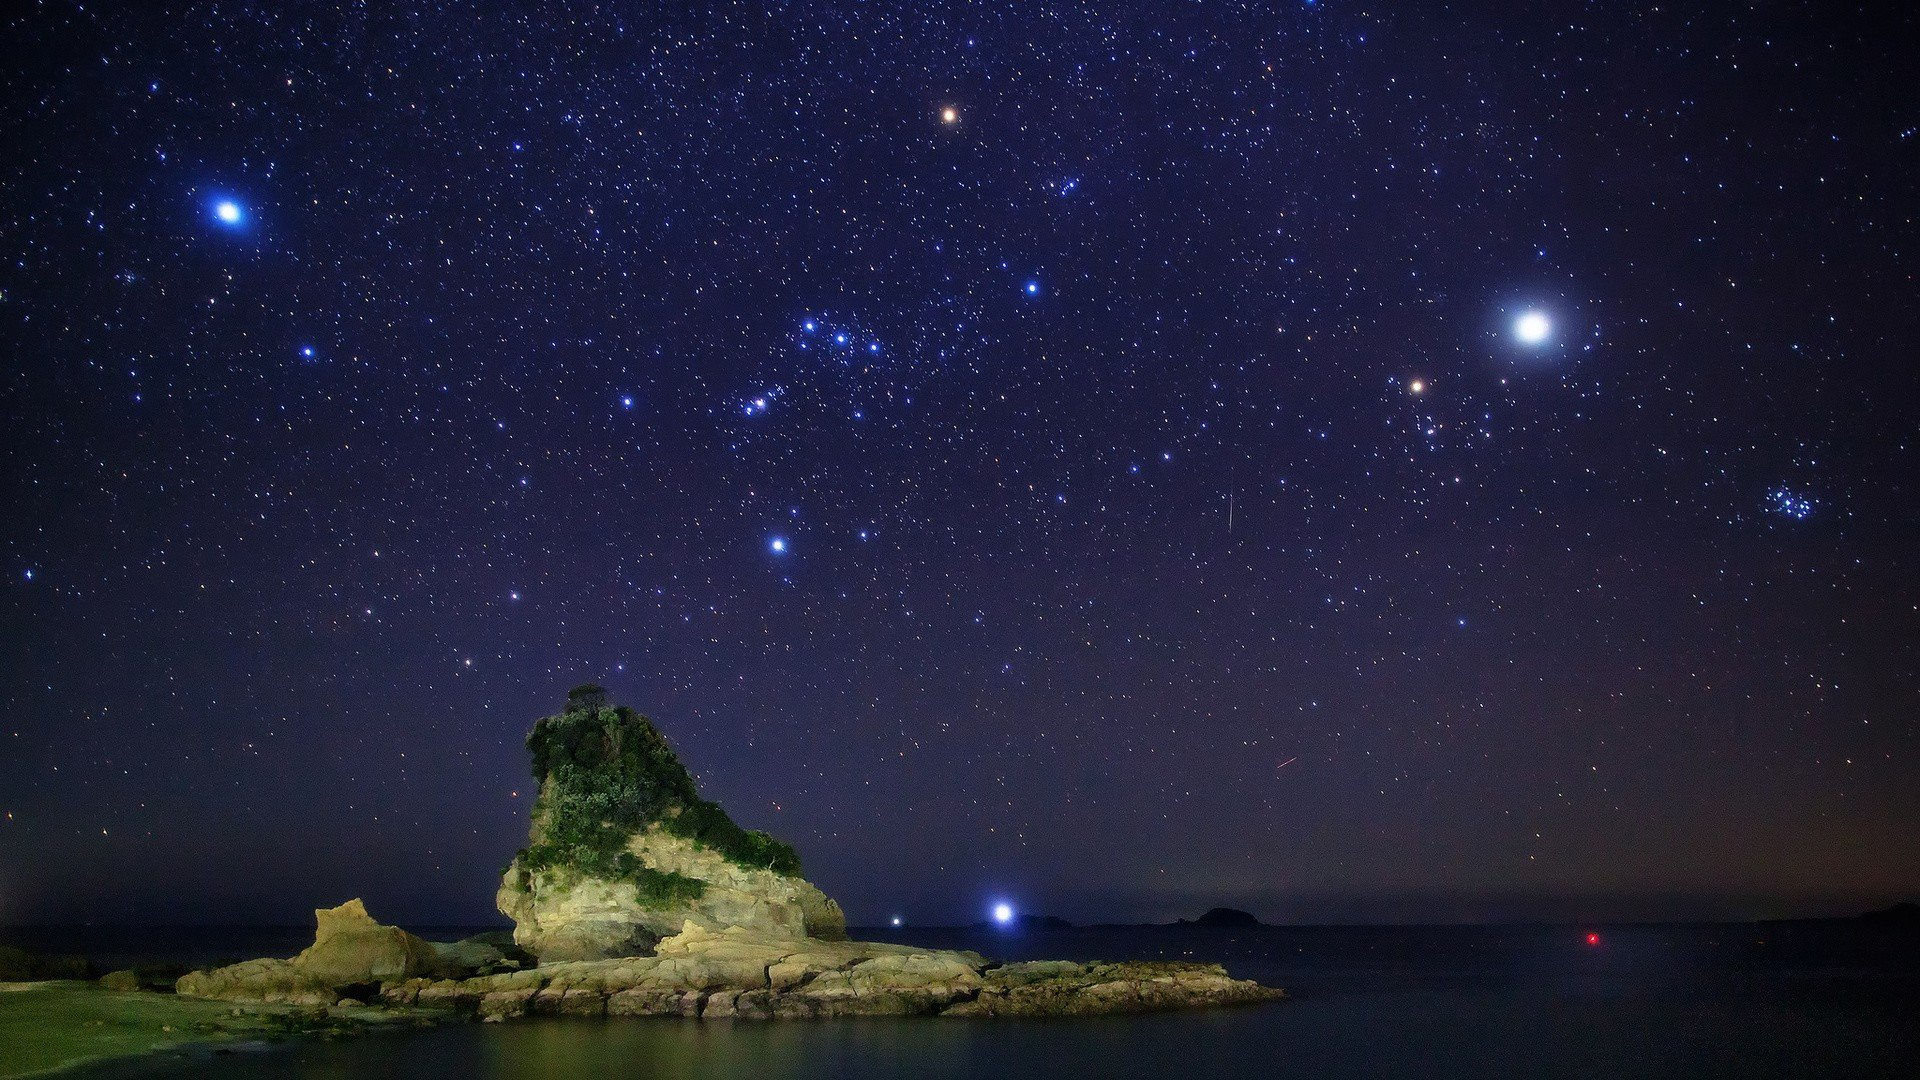 stars at night wallpaper - photo #42